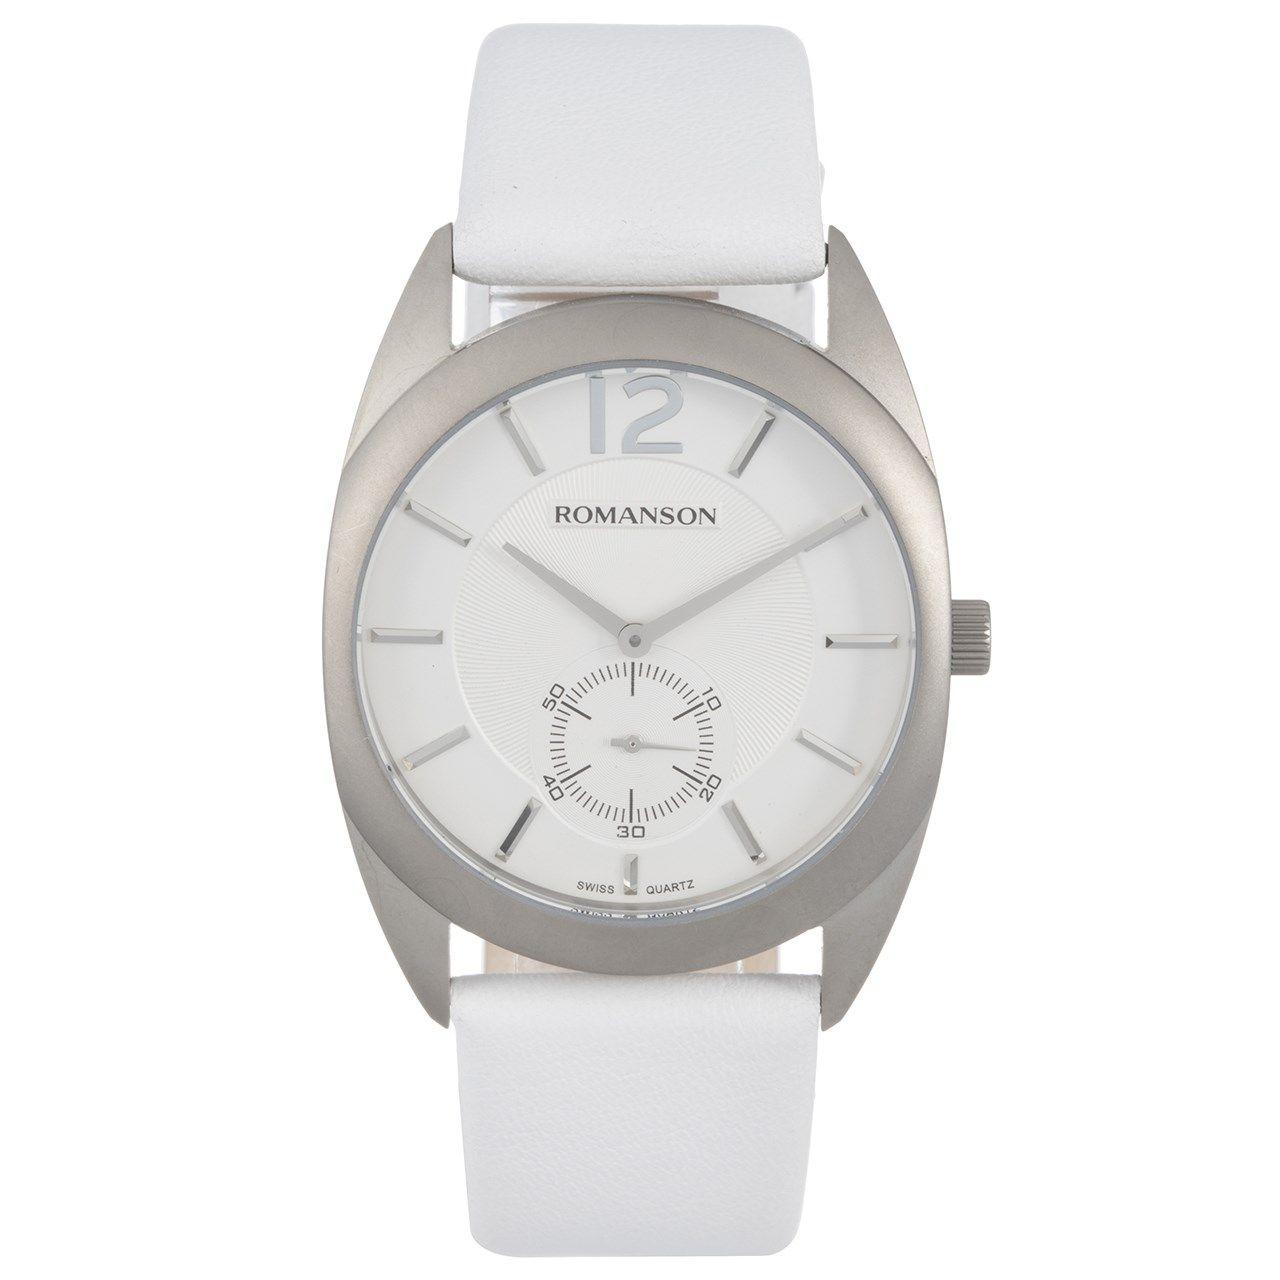 ساعت مچی عقربه ای مردانه رومانسون مدل TL1246MM1WAS2W -  - 1